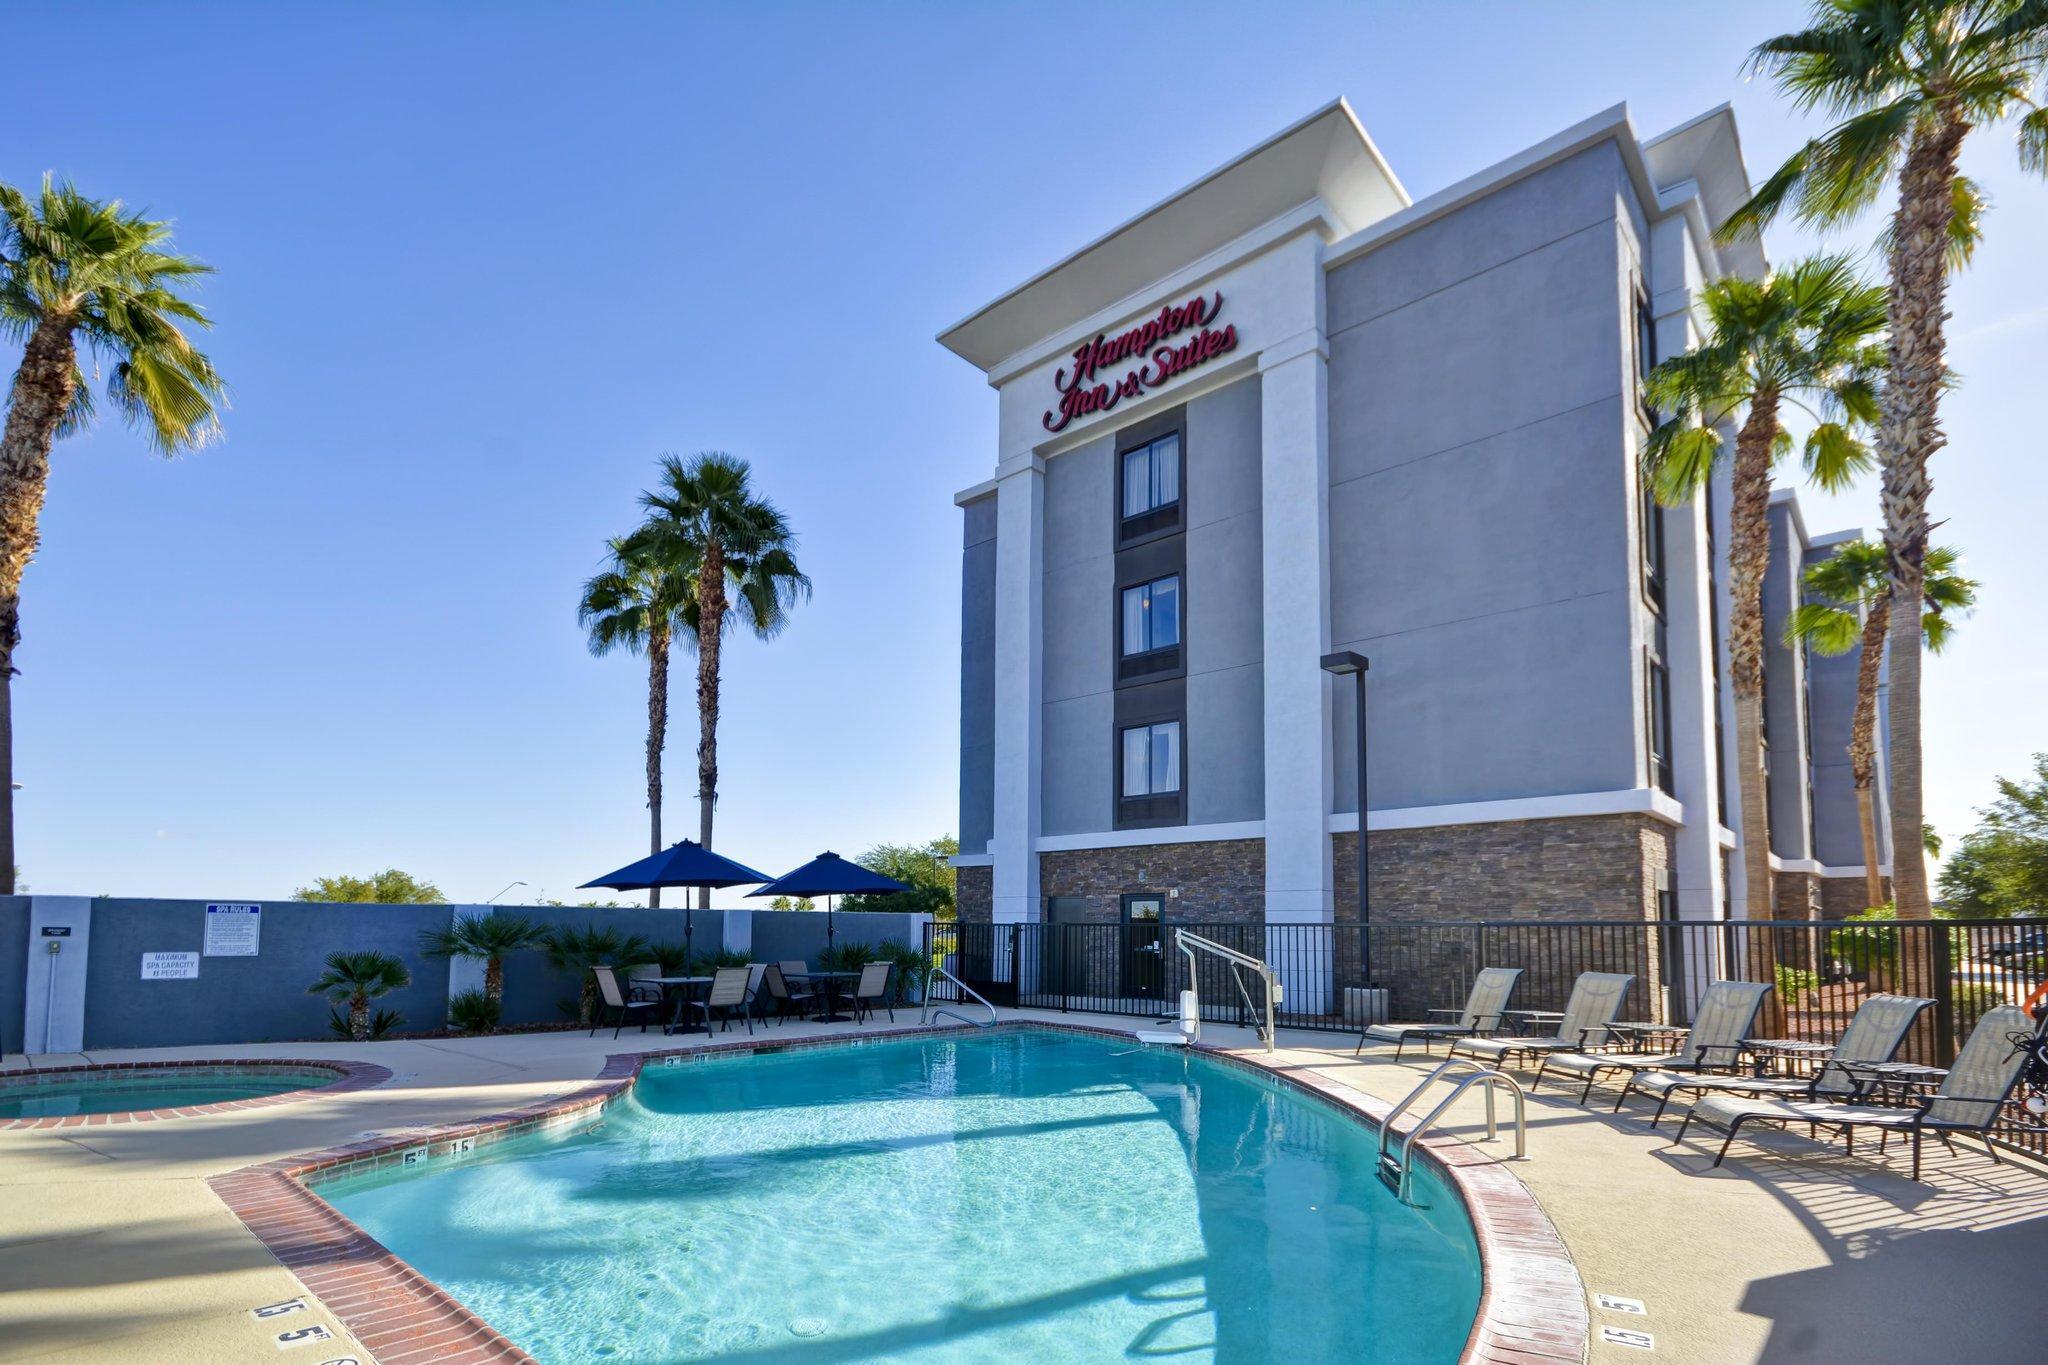 Hampton Inn And Suites Yuma